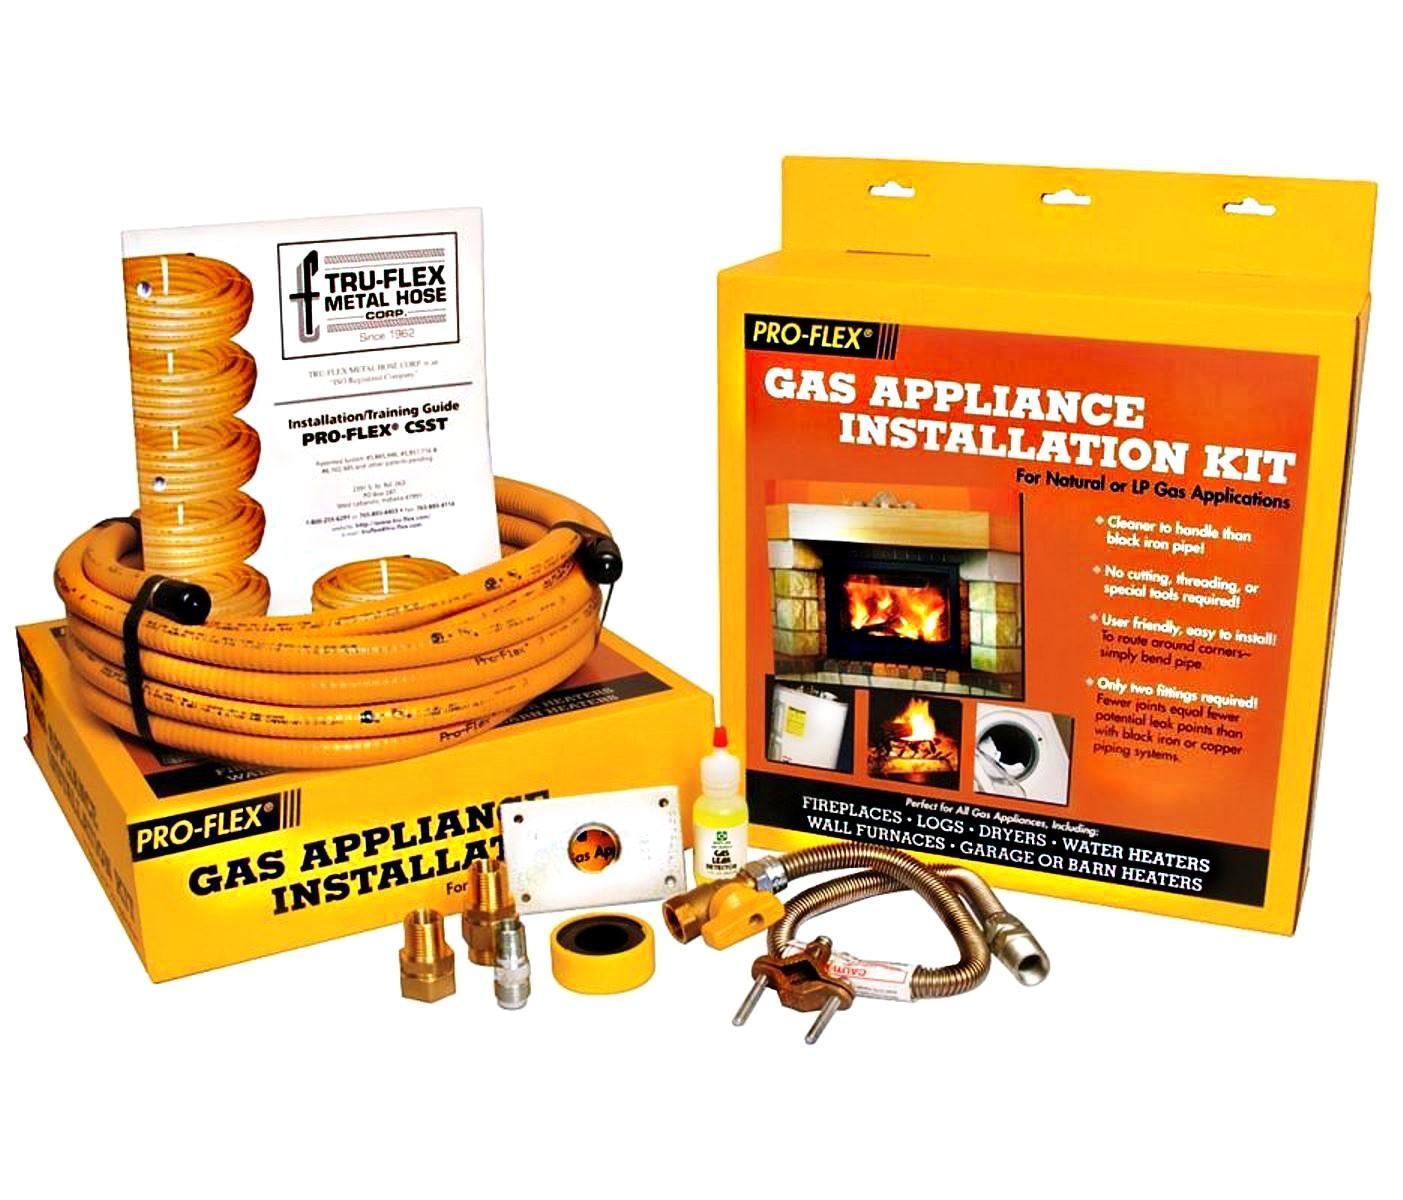 Gas Appliance Installation : Buy the pro flex pfsagk gas appliance installation